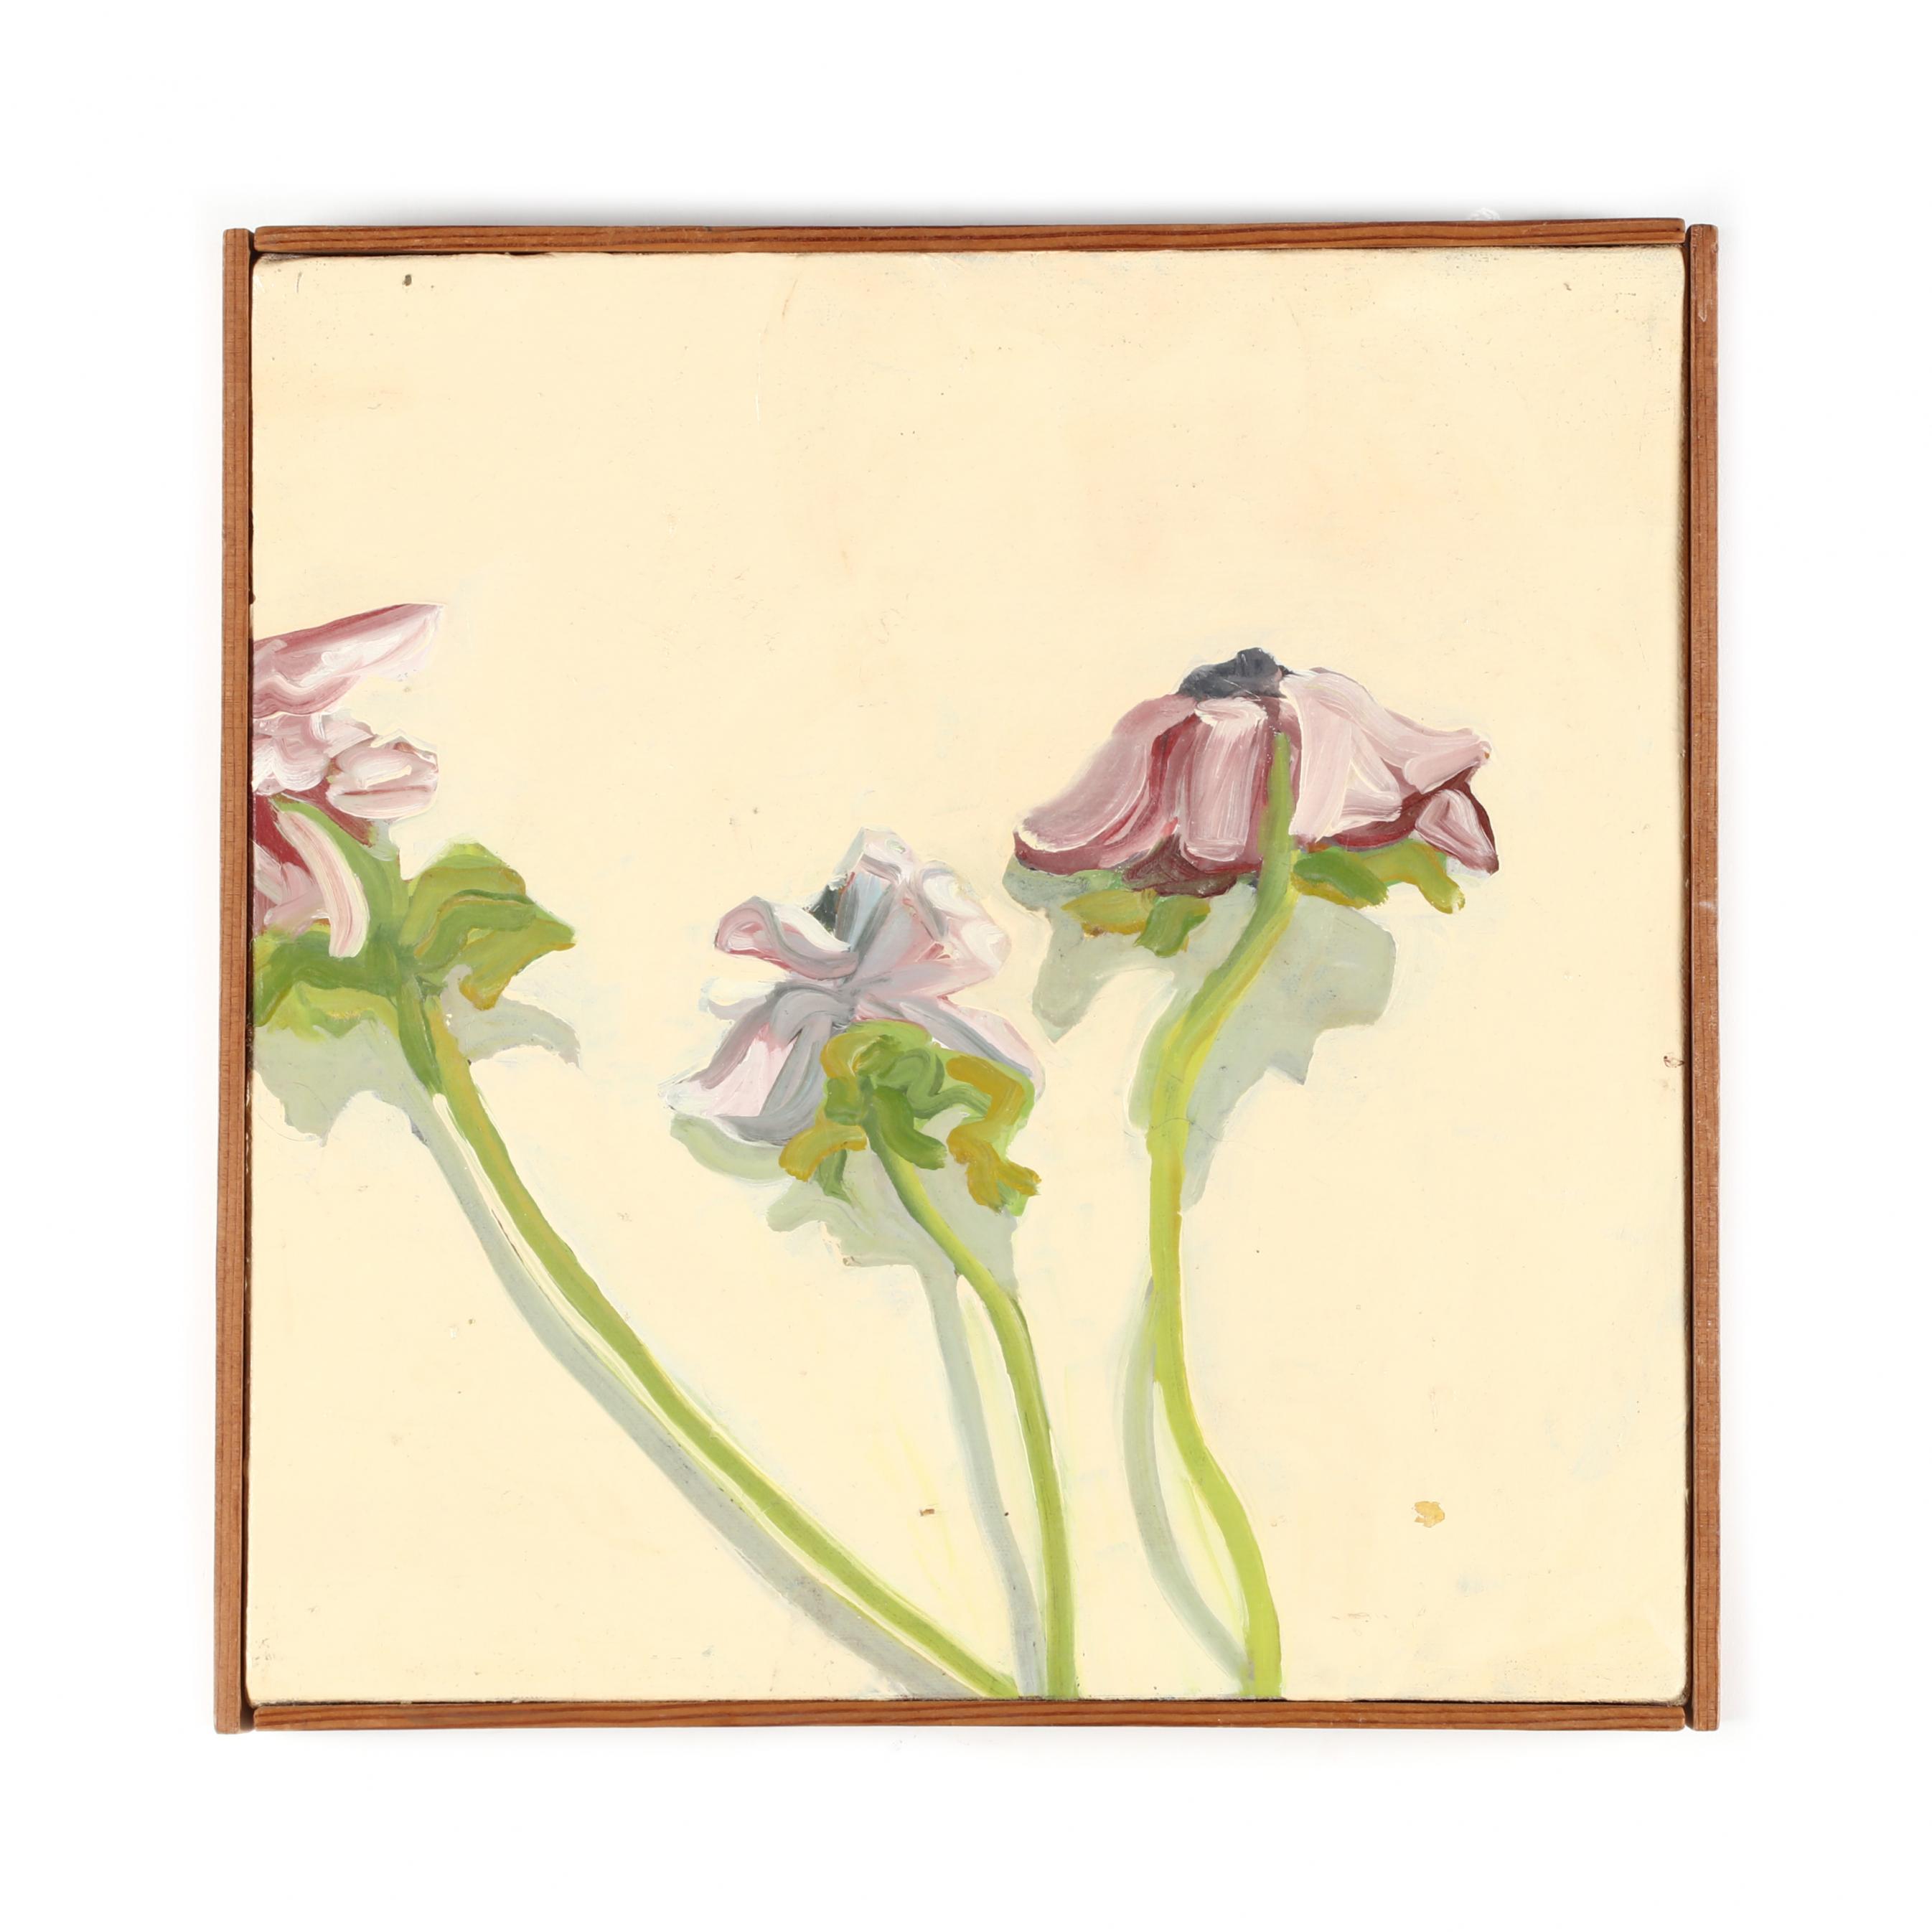 lucy-spencer-nc-i-anemones-ii-i